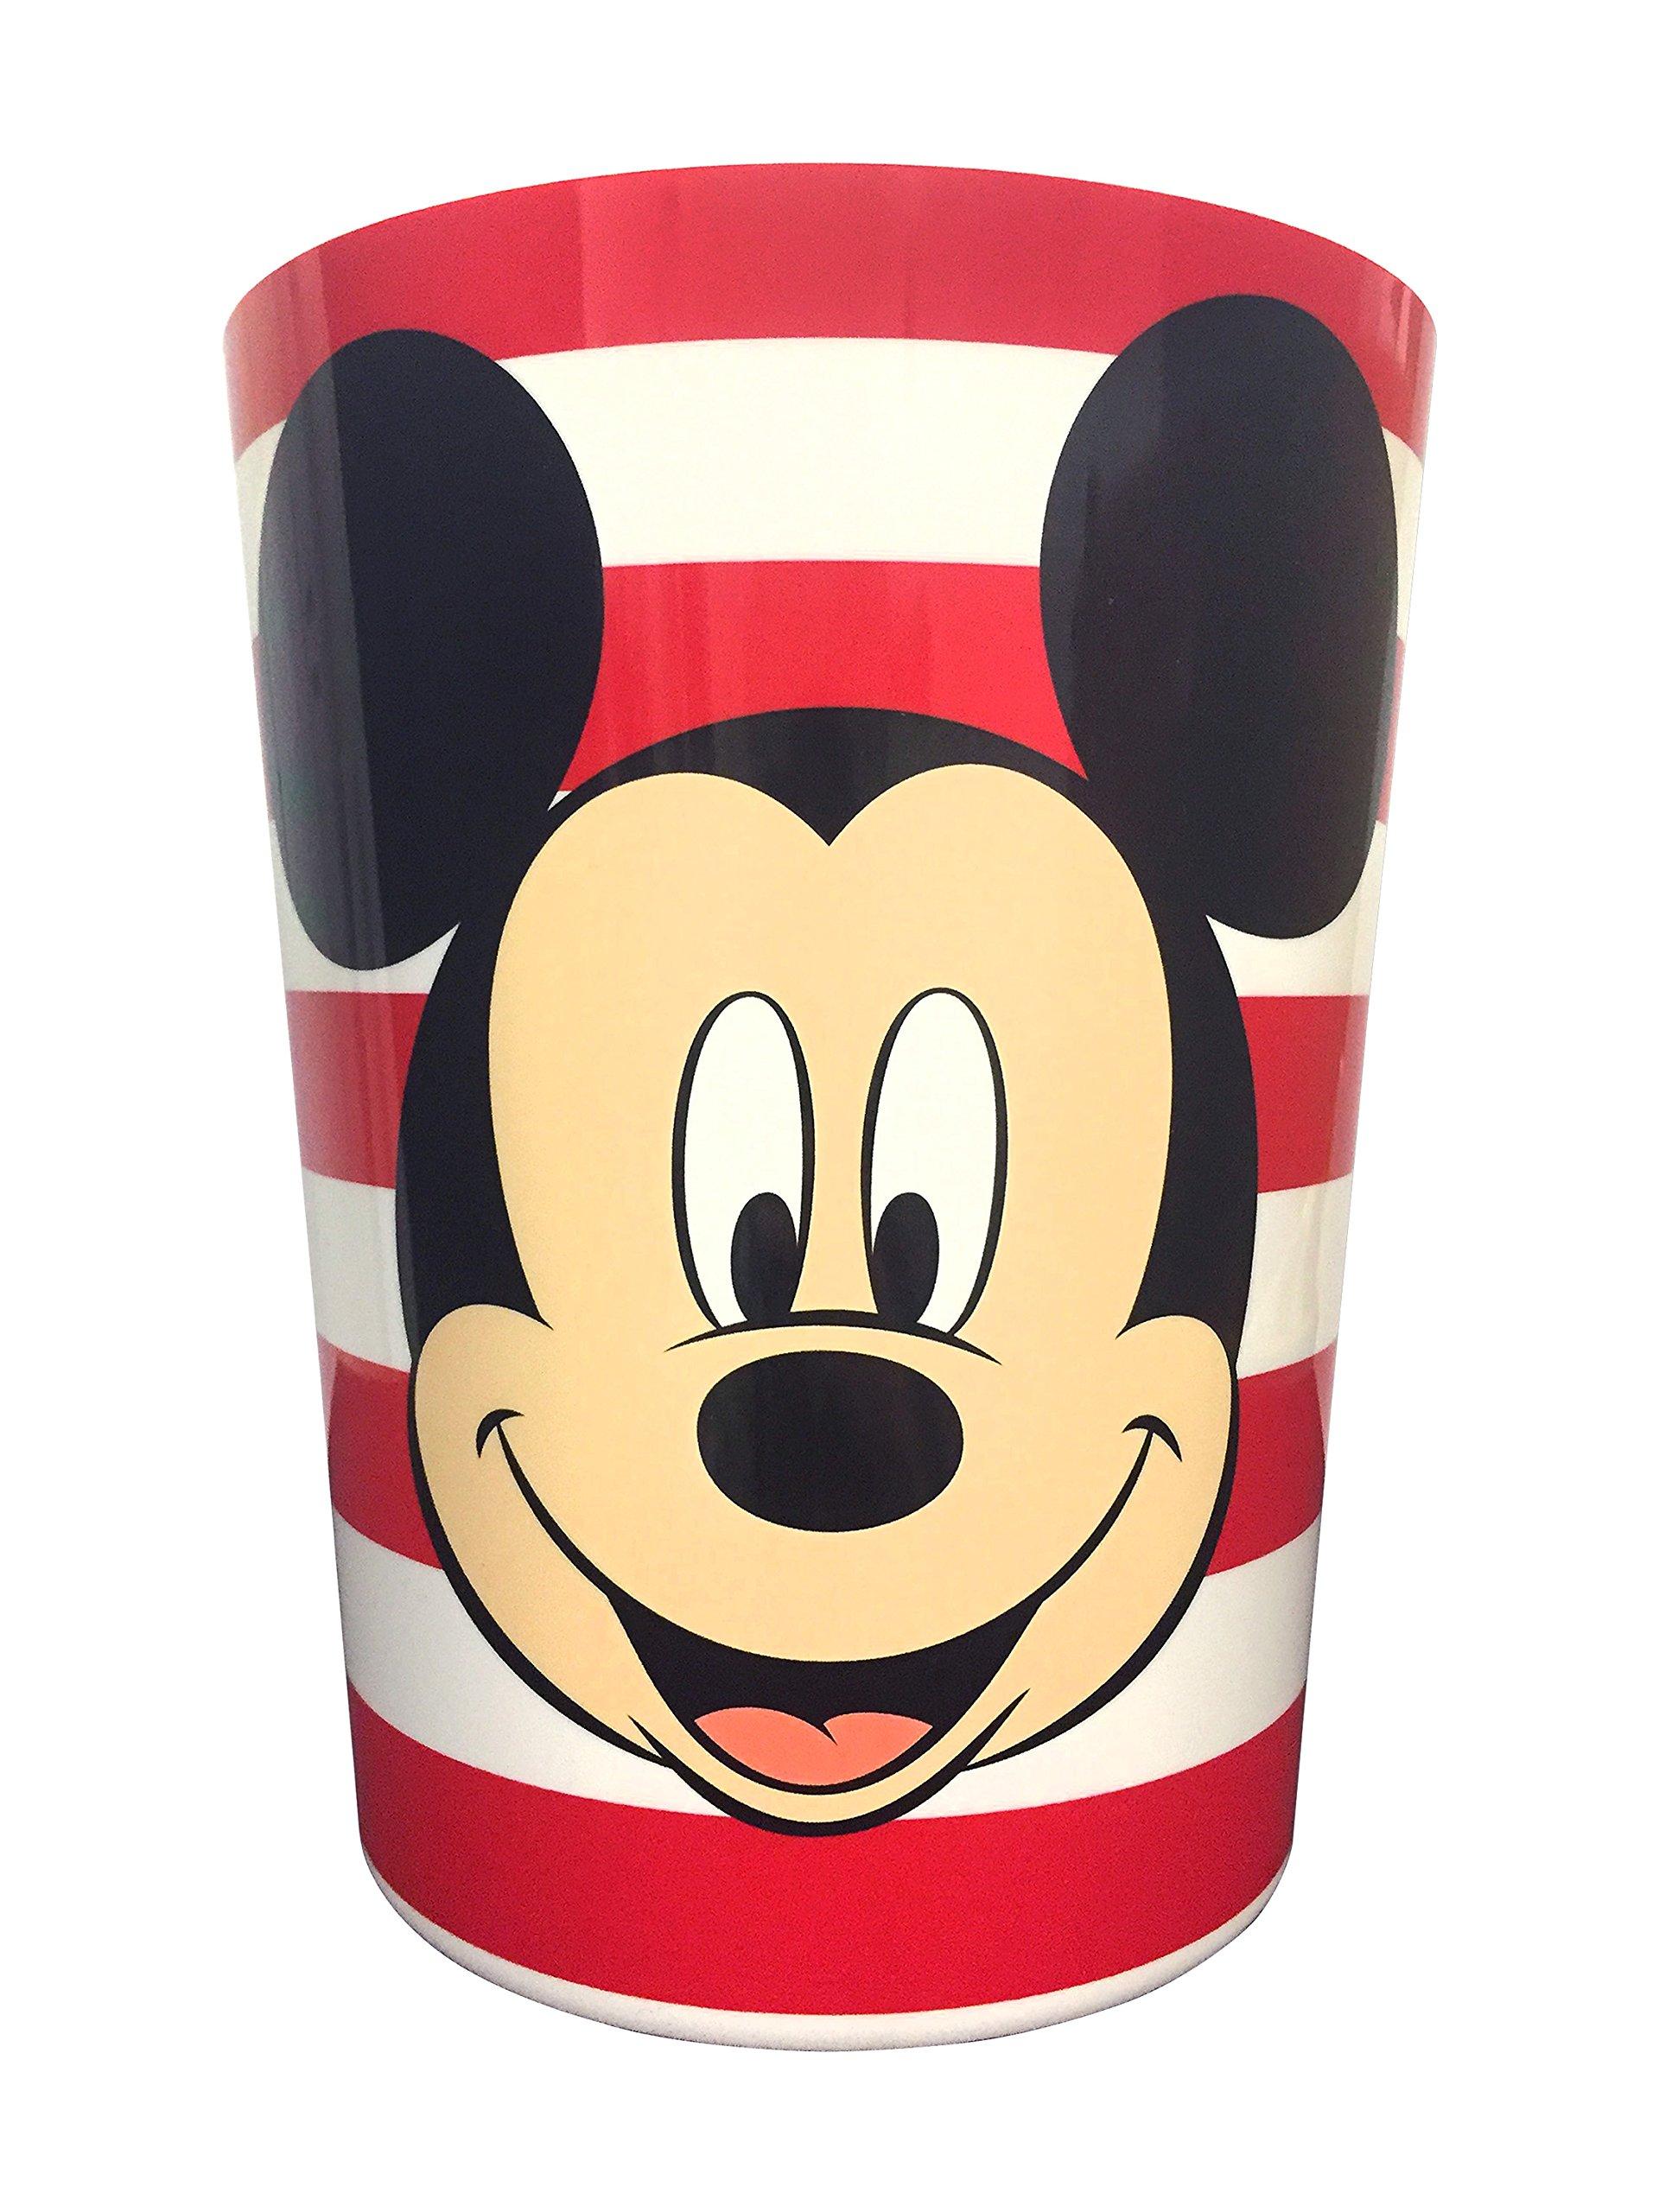 Mickey Mouse Full Bath Set, Shower Curtain, Hooks. Bath and Hand Towel, Foam Rug, Toothbrush Holder, Wastebin and Soap Pump